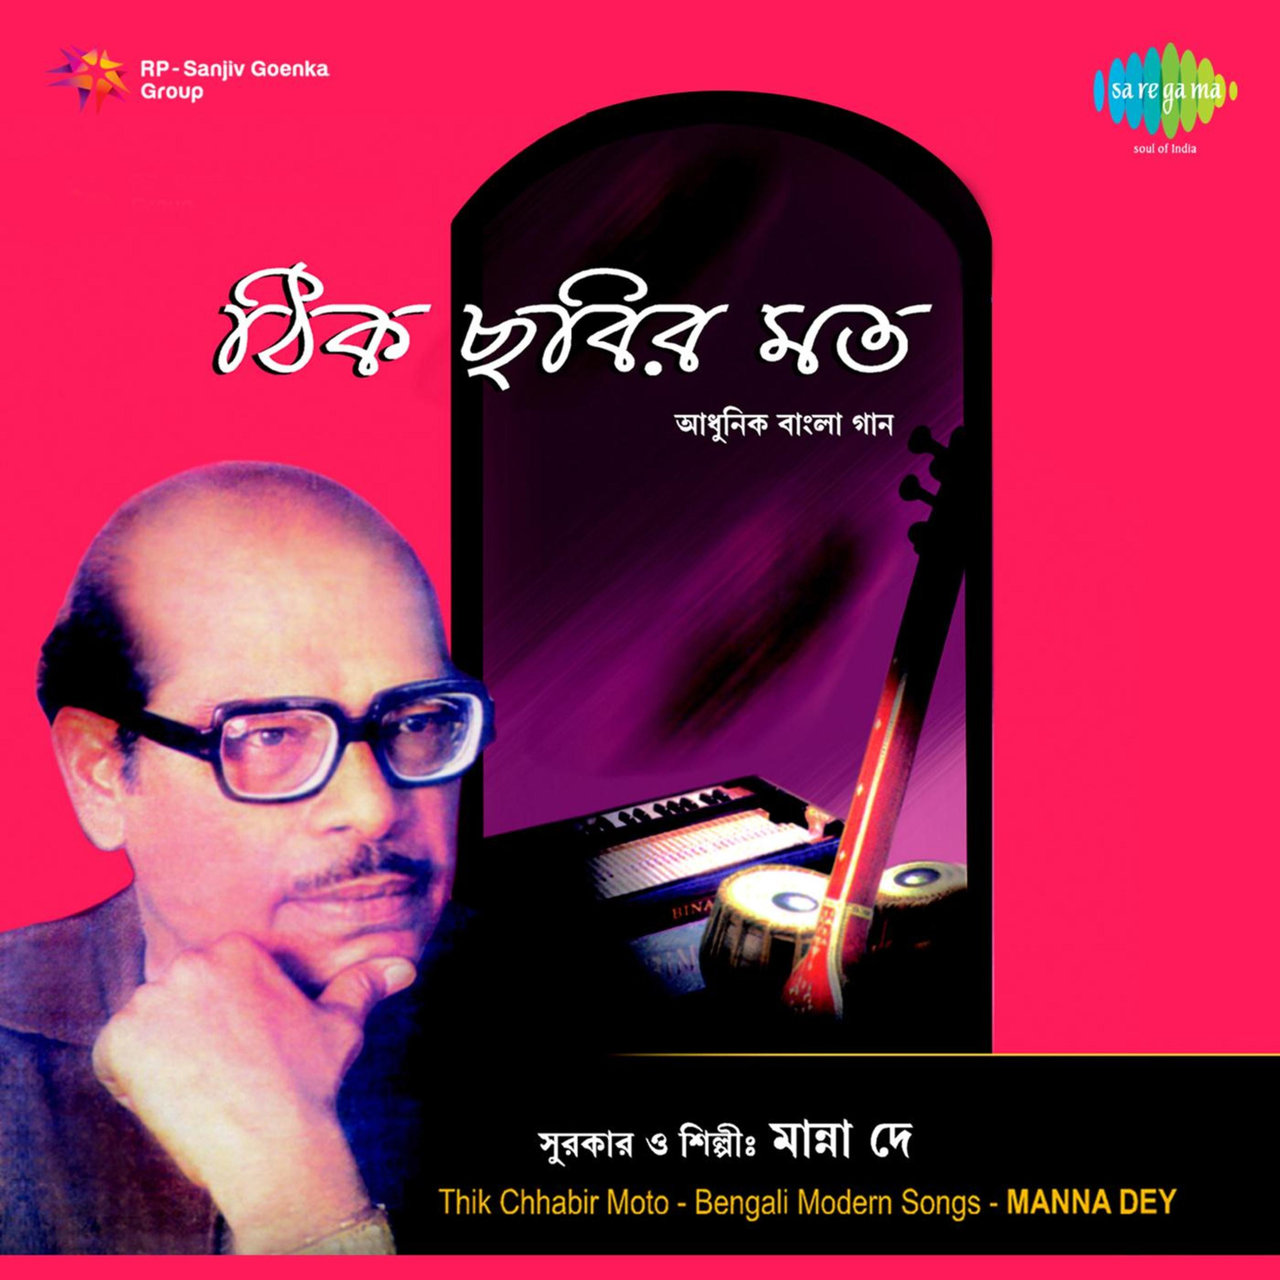 Esechhi Ami Esechhi Manna Dey: TIDAL: Listen To Jharna Jhar Jhariye On TIDAL